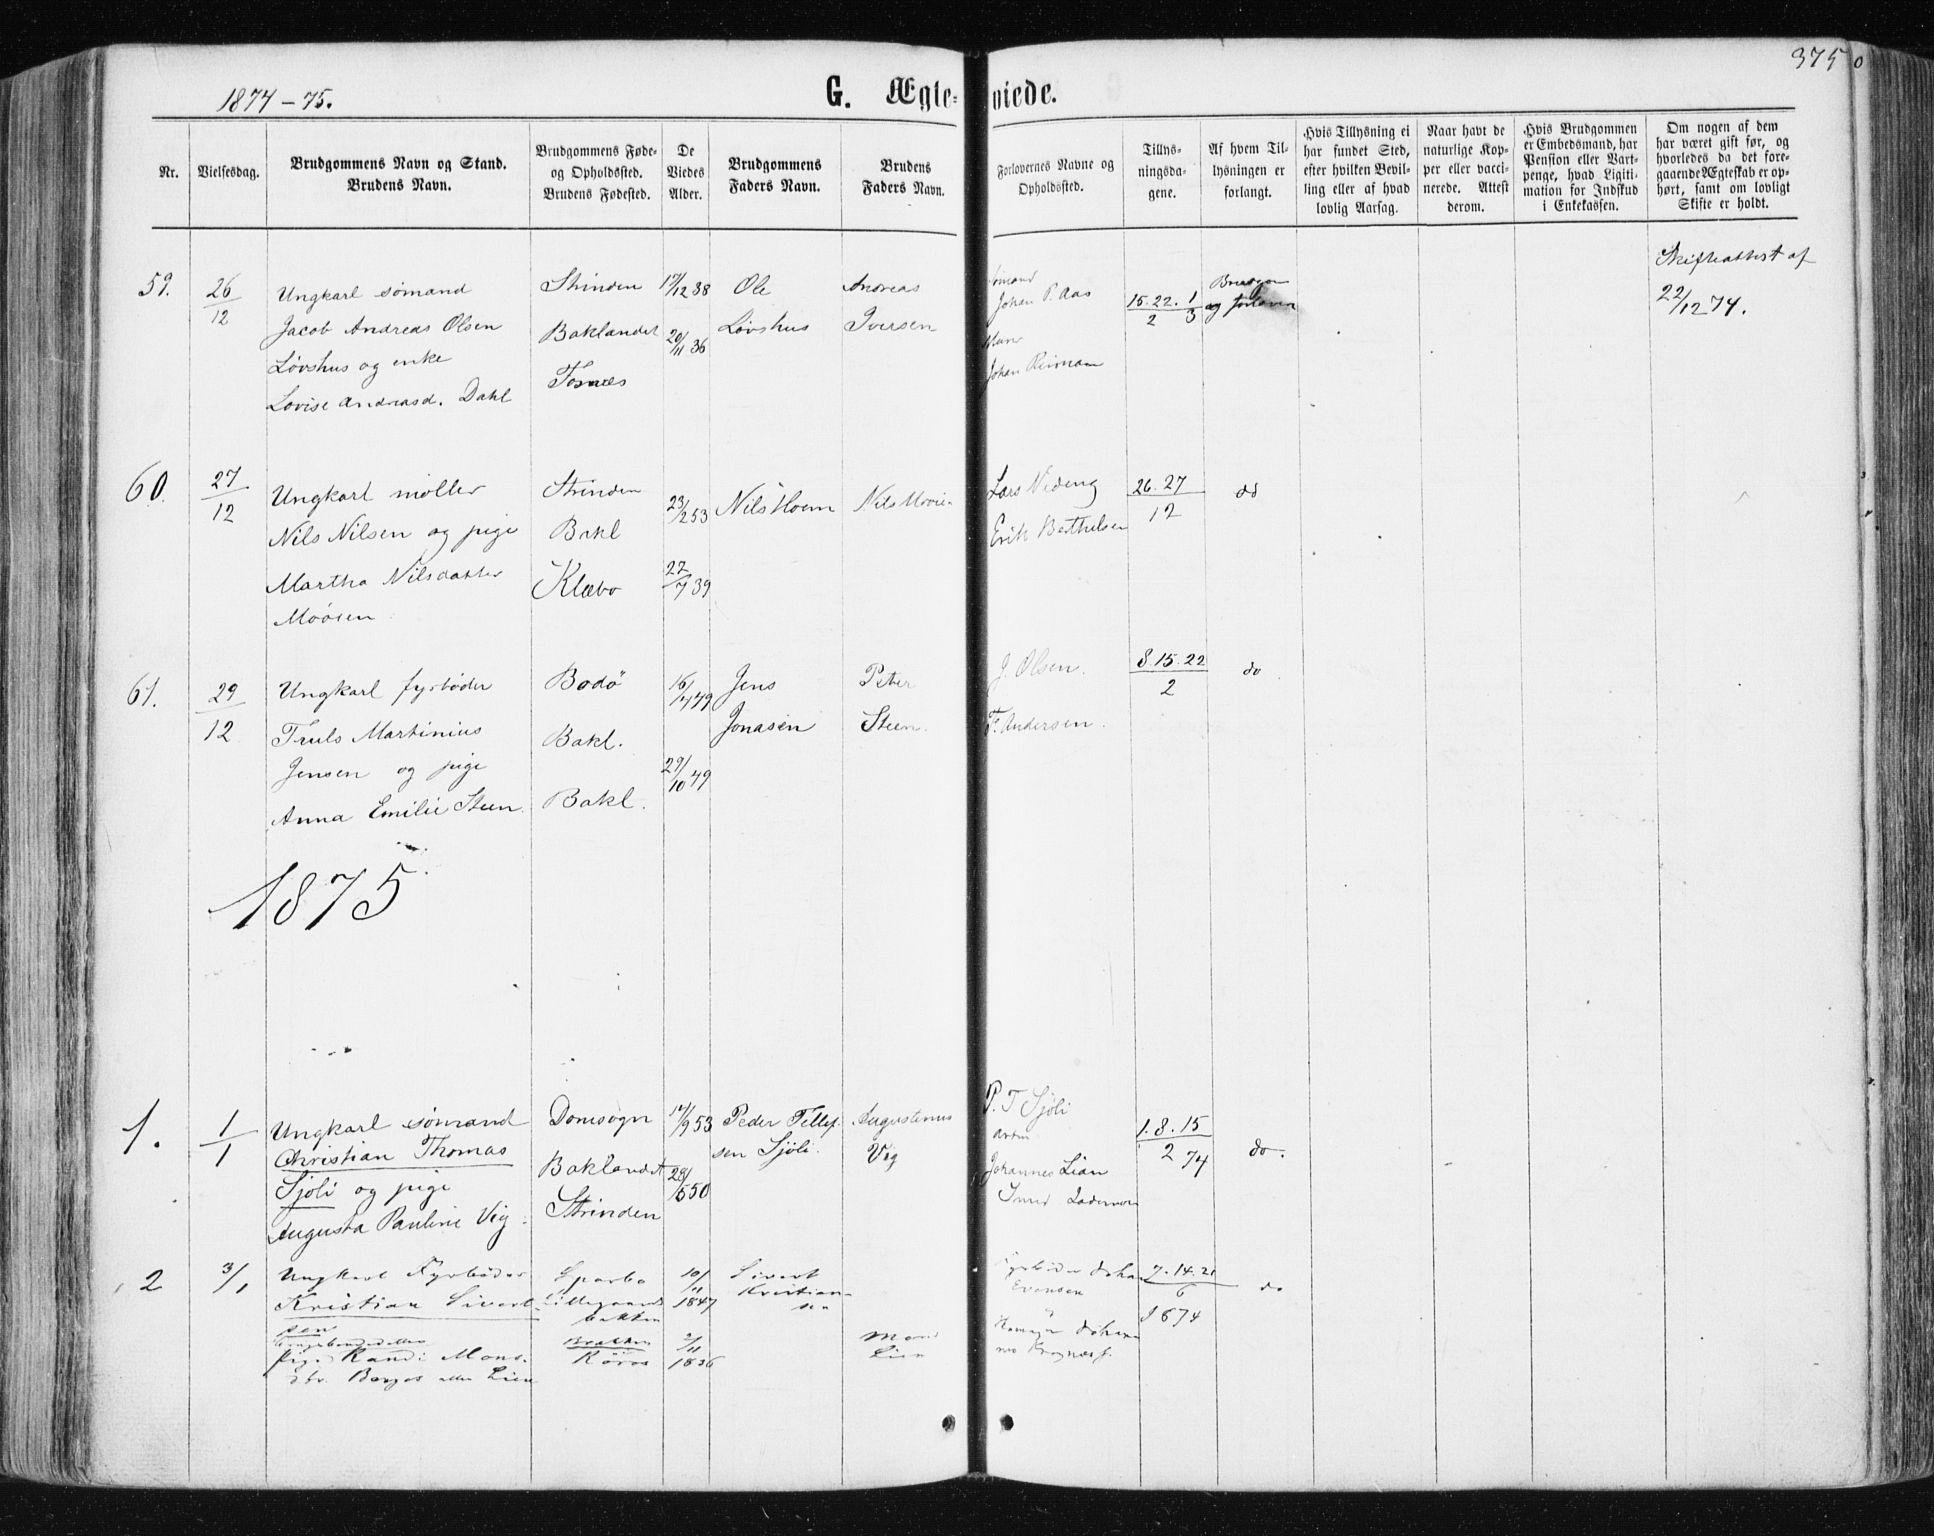 SAT, Ministerialprotokoller, klokkerbøker og fødselsregistre - Sør-Trøndelag, 604/L0186: Parish register (official) no. 604A07, 1866-1877, p. 375